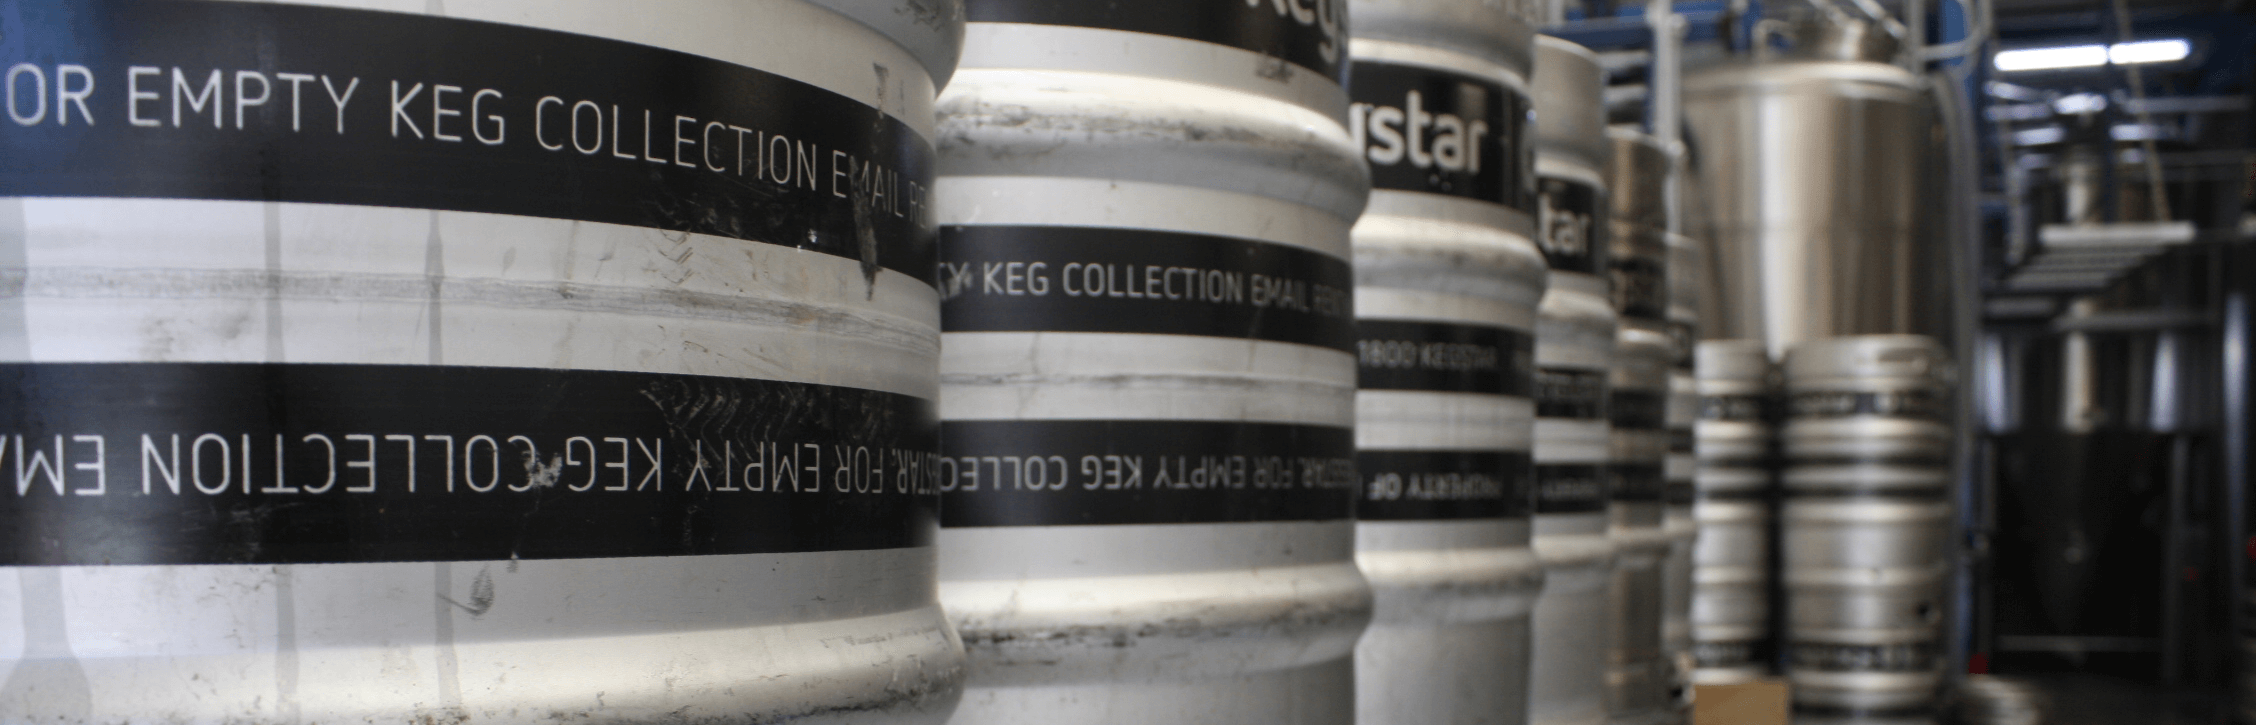 Hairyman brewery sydney beer